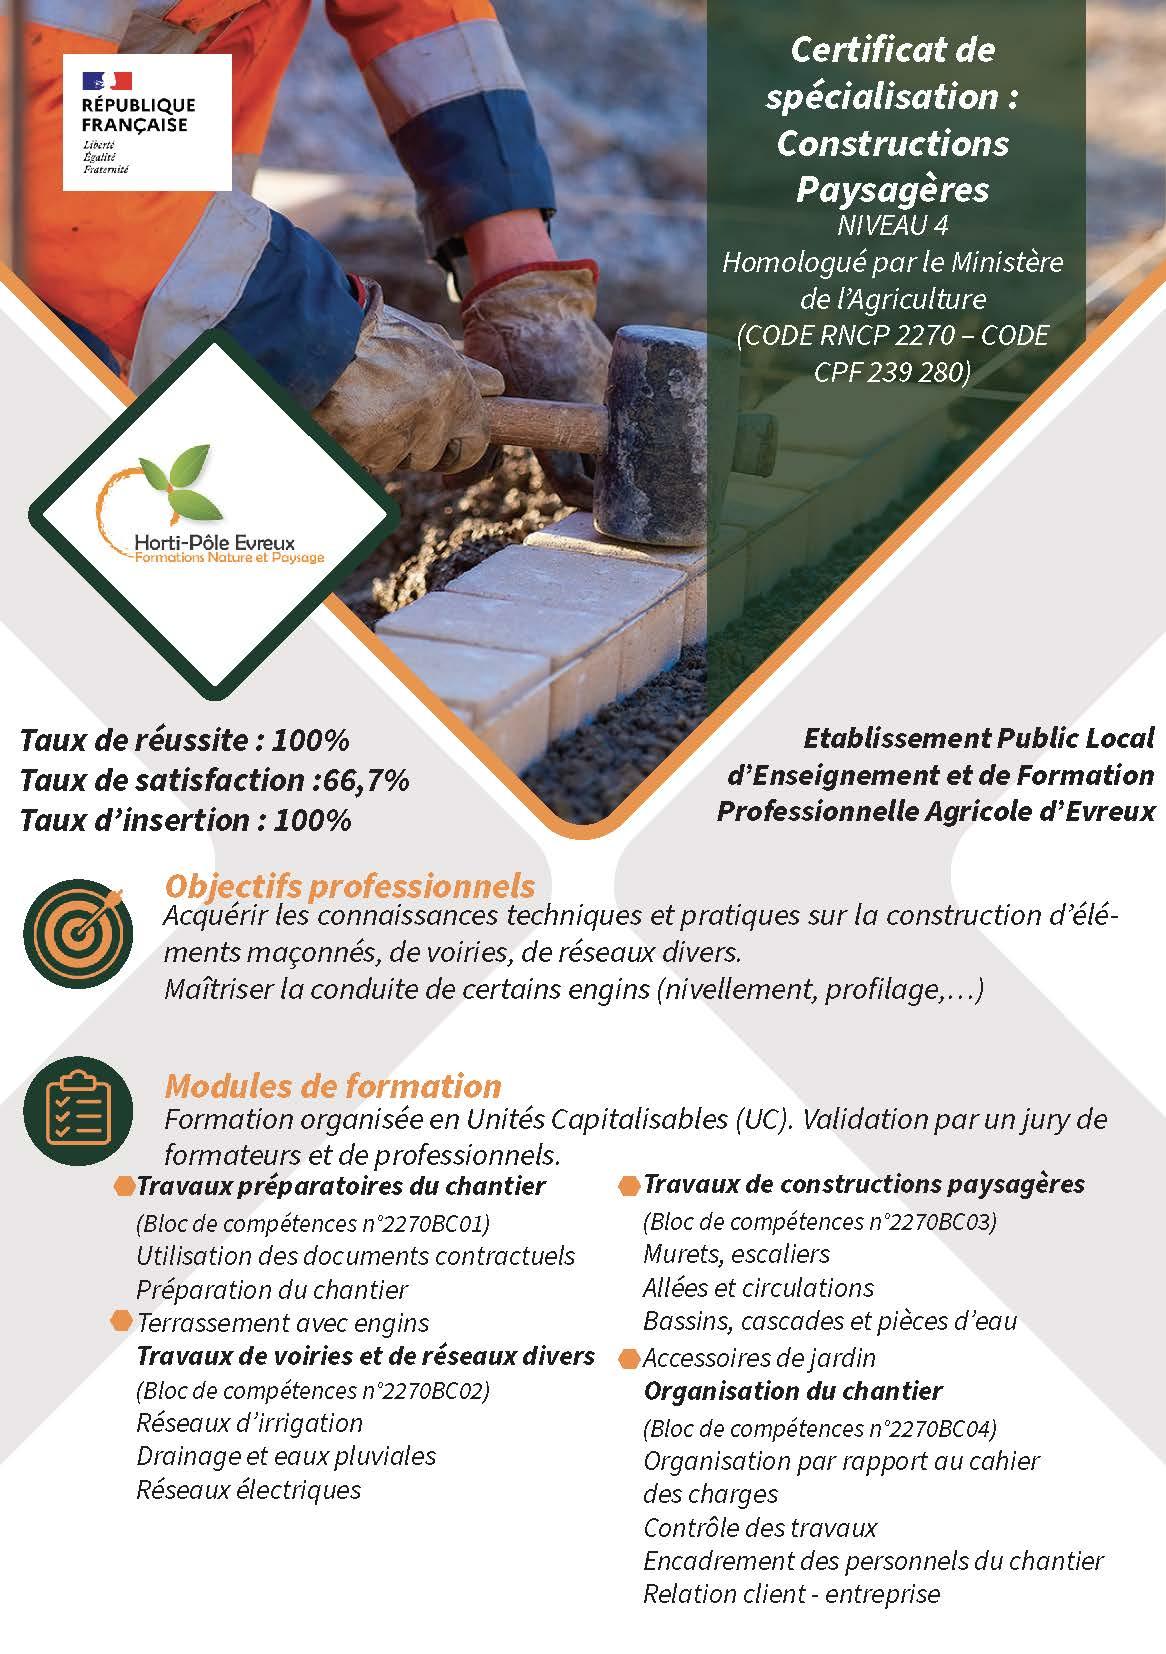 cs constructions paysagères cfppa_Page_1